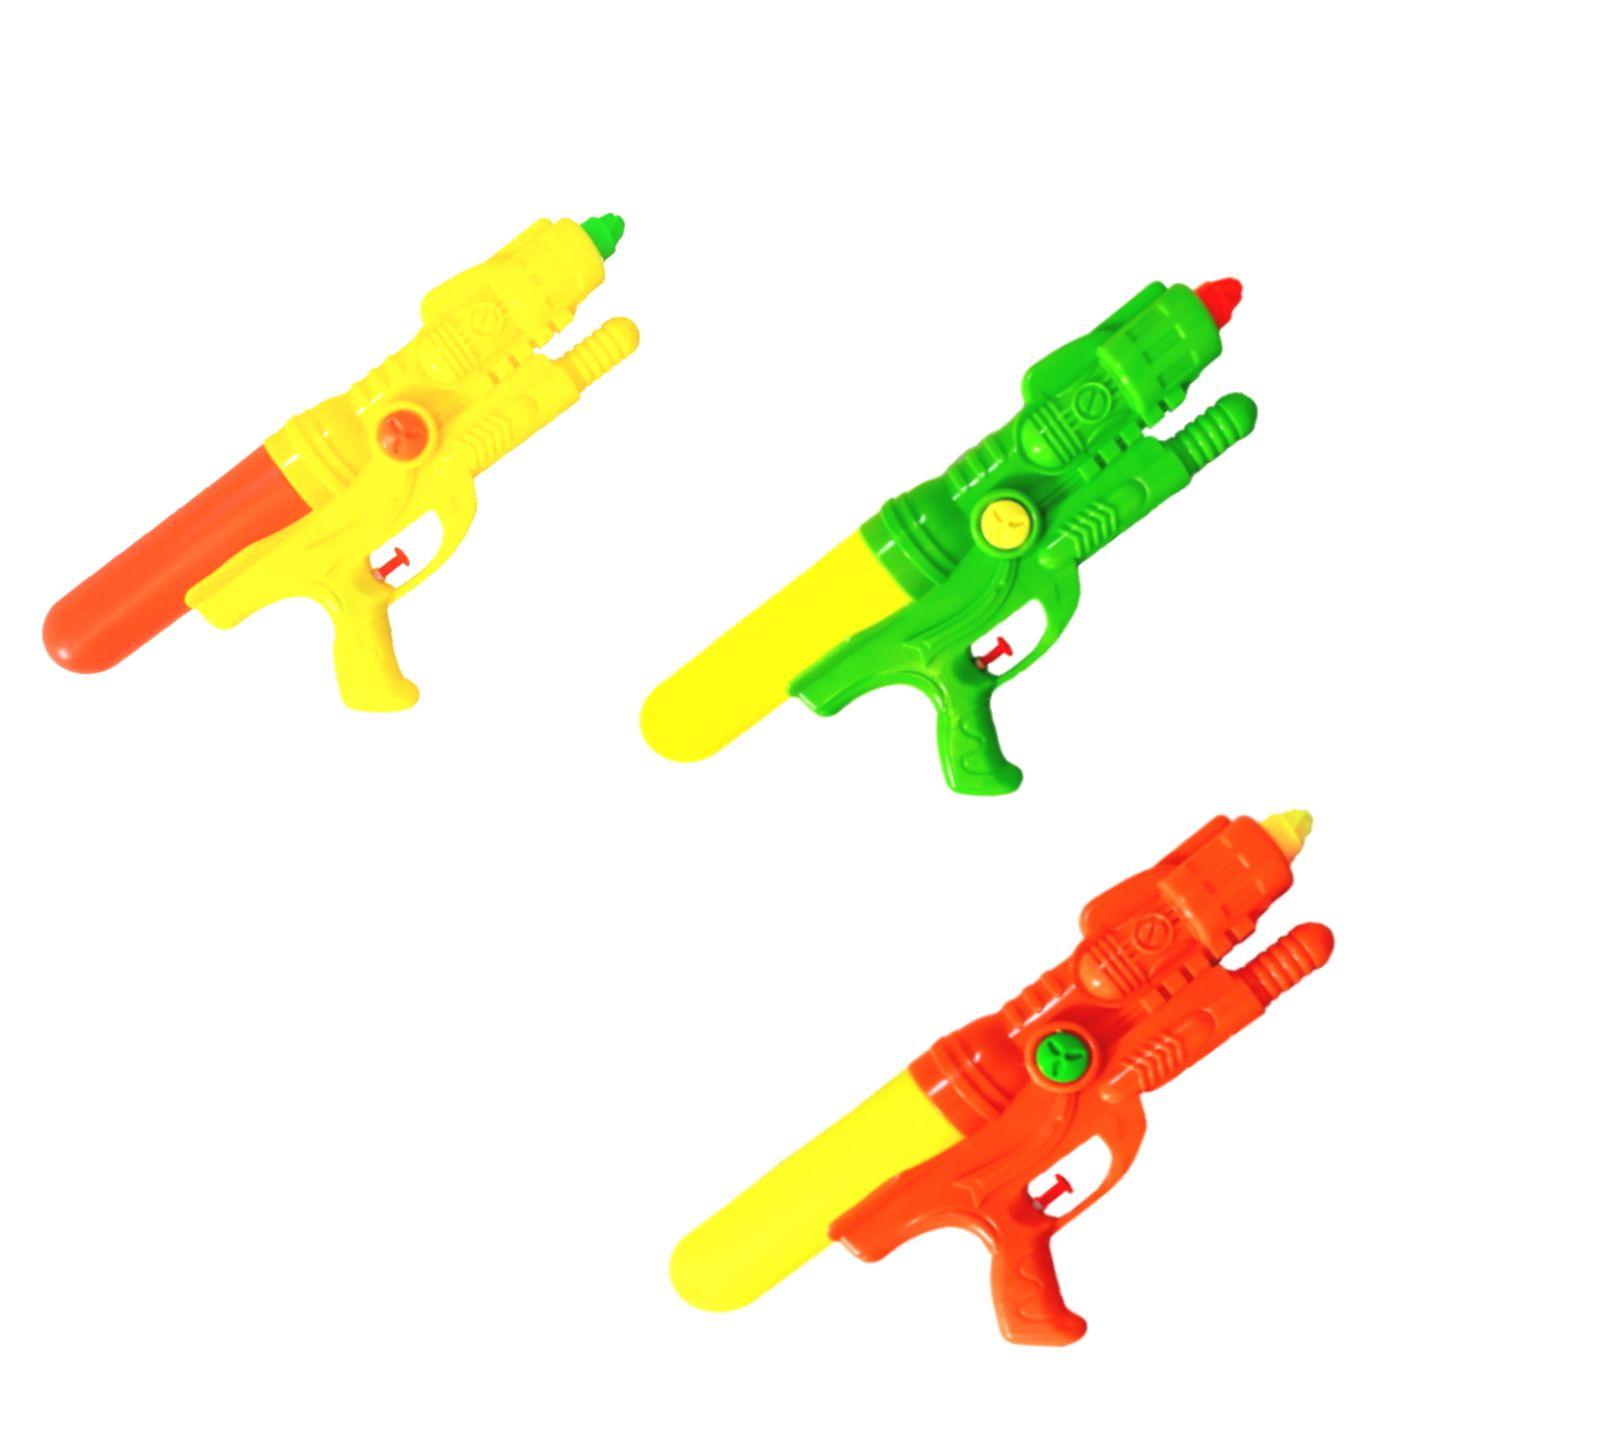 Kit com 3 Pistolas de água Arminha Flix Water Gun 350ml 33 Cm